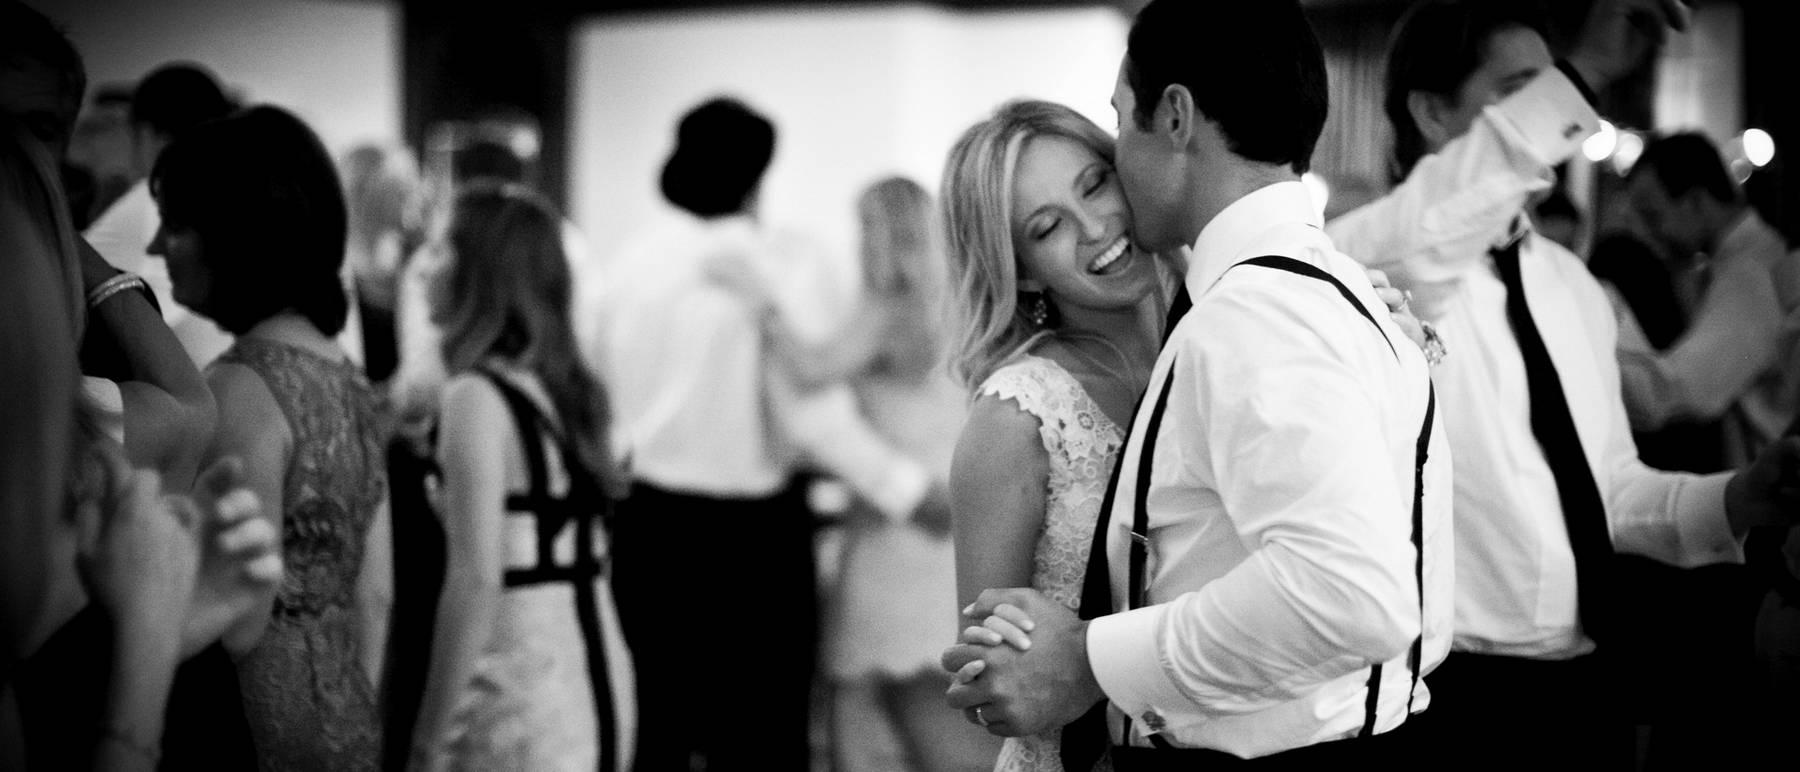 johnandjoseph-wedding-photographer-hz-slider-245